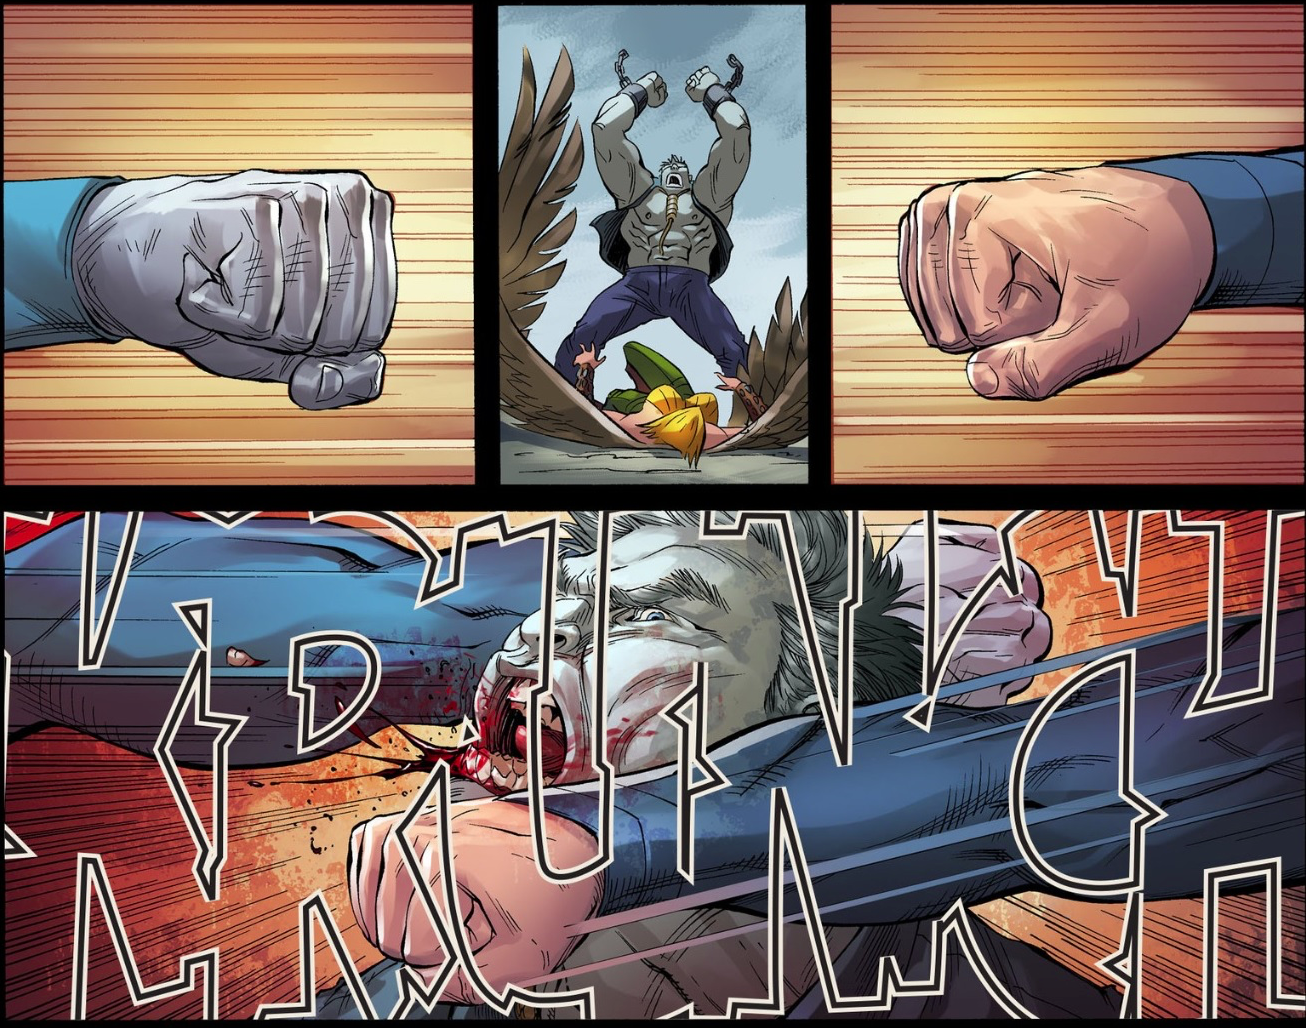 Superman Meets Bizarro (Injustice Gods Among Us)